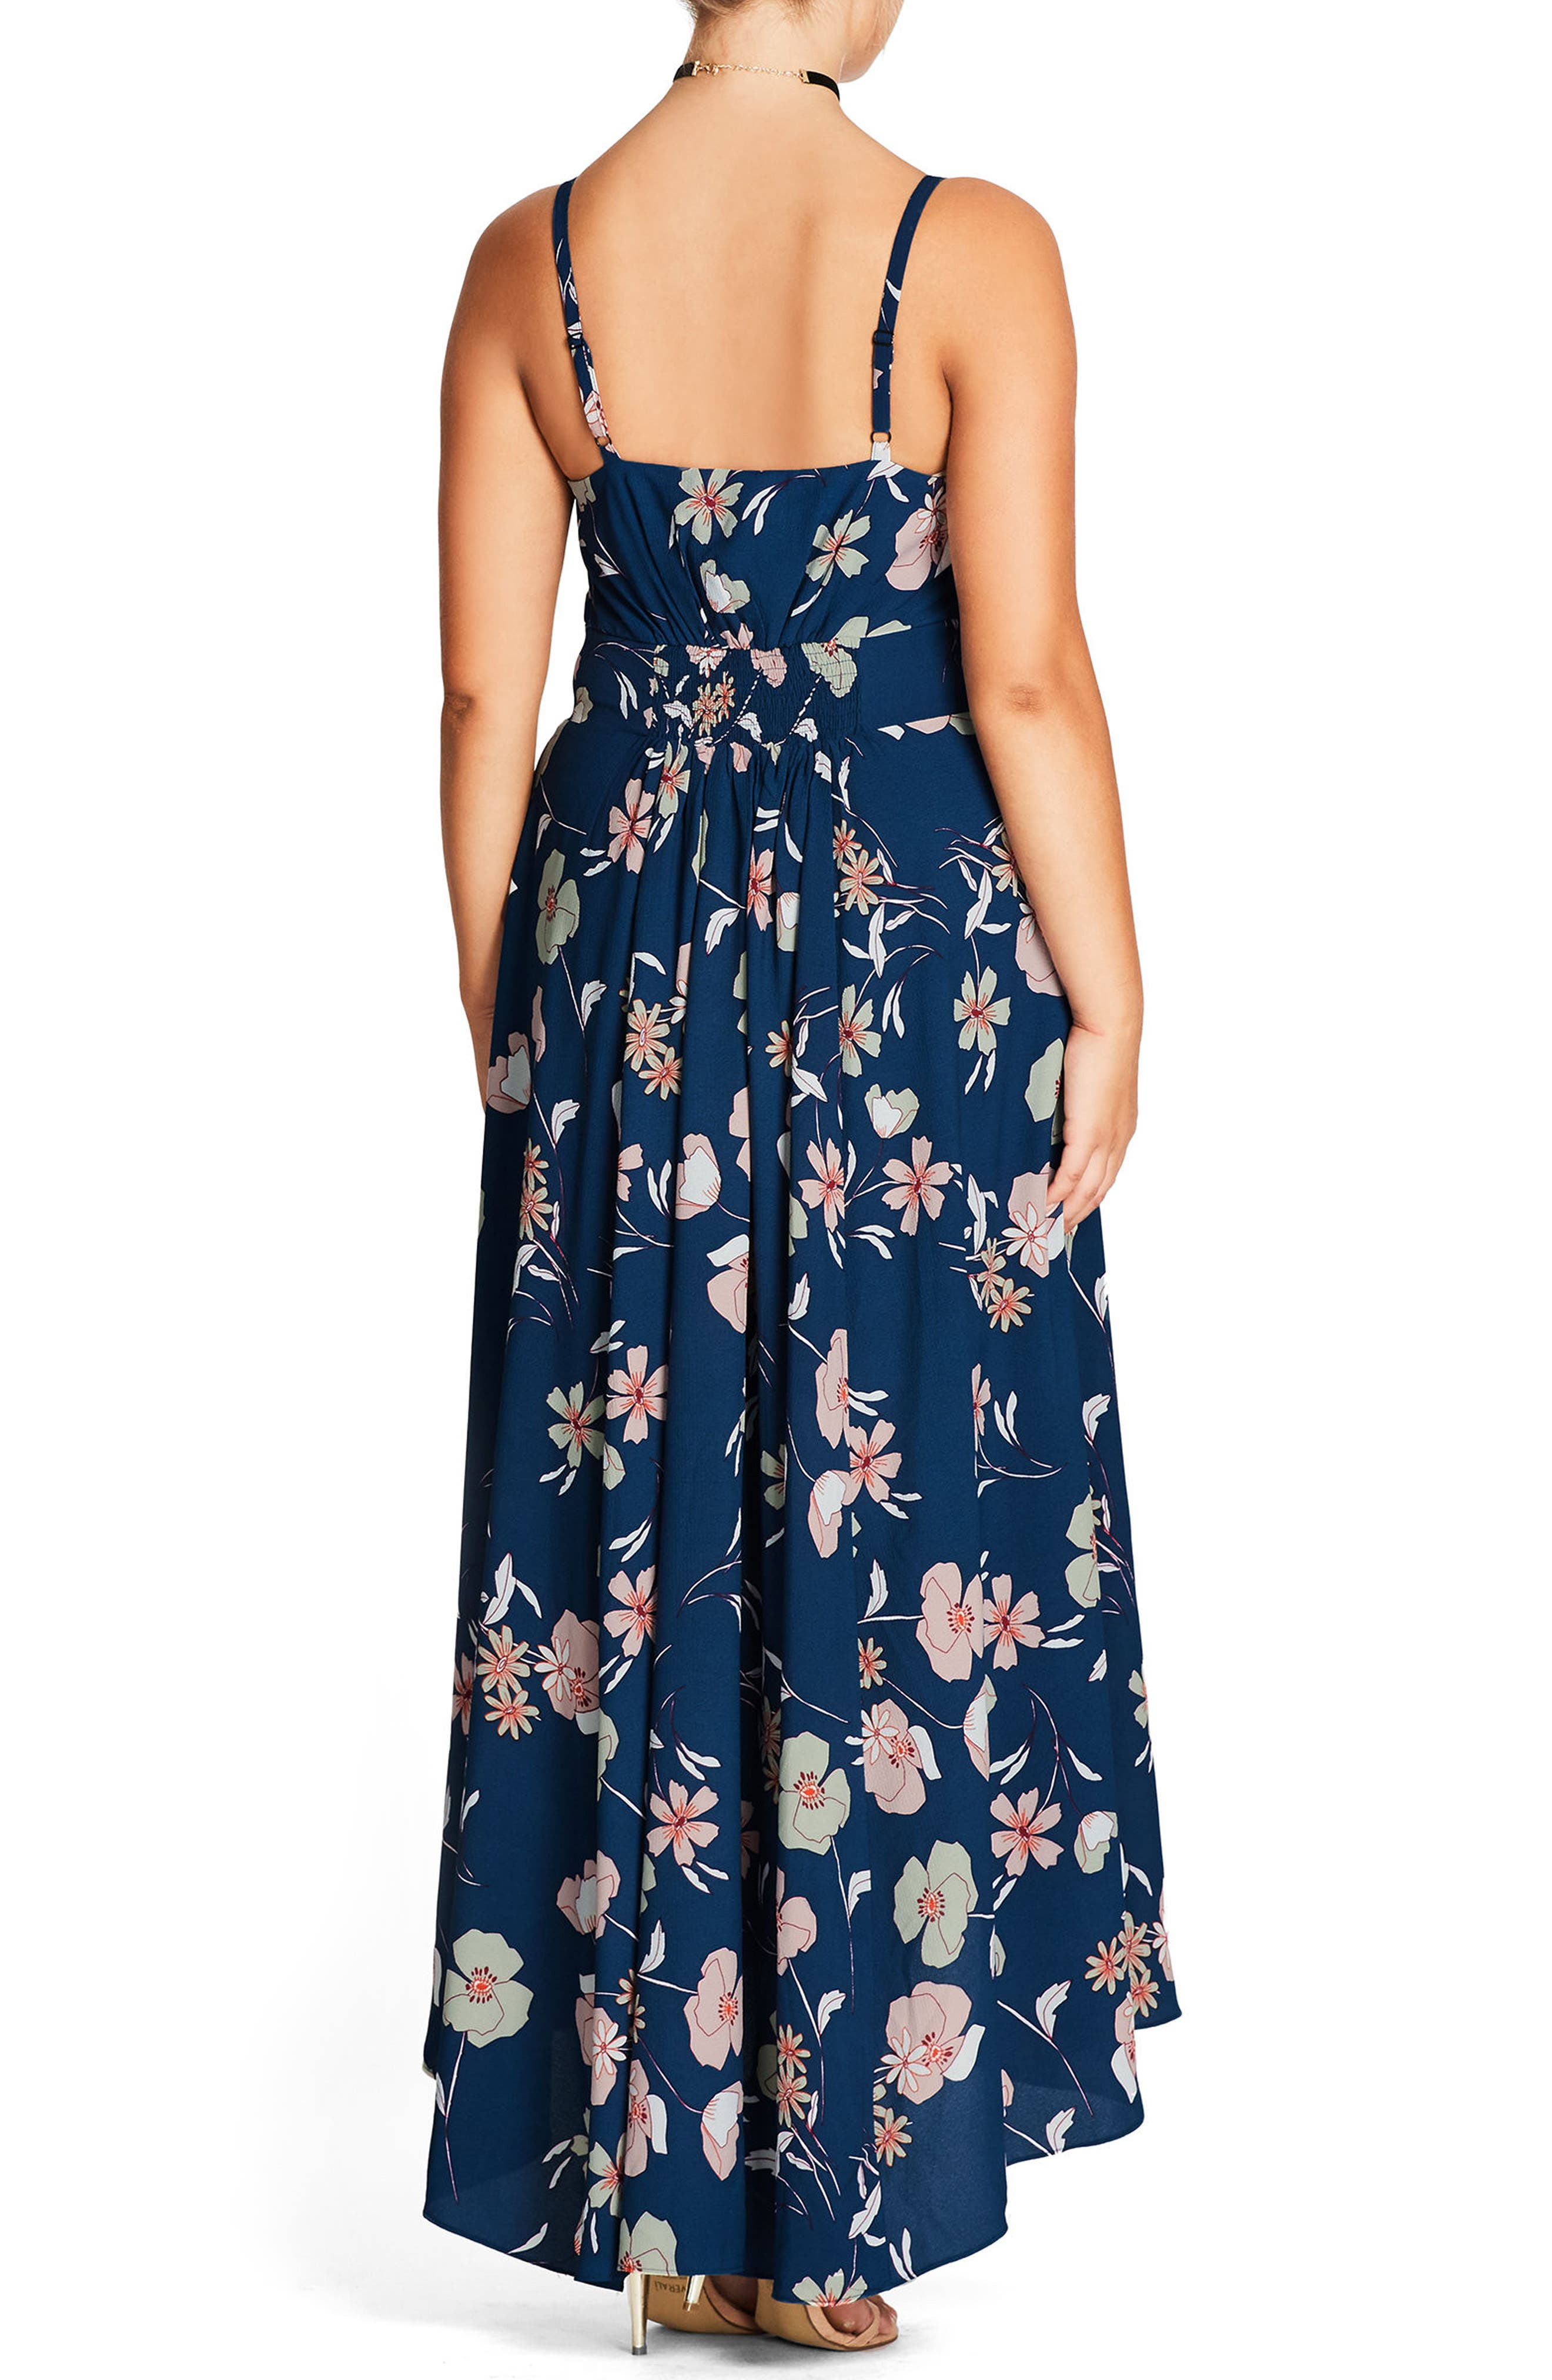 Naive Floral Maxi Dress,                             Alternate thumbnail 2, color,                             616